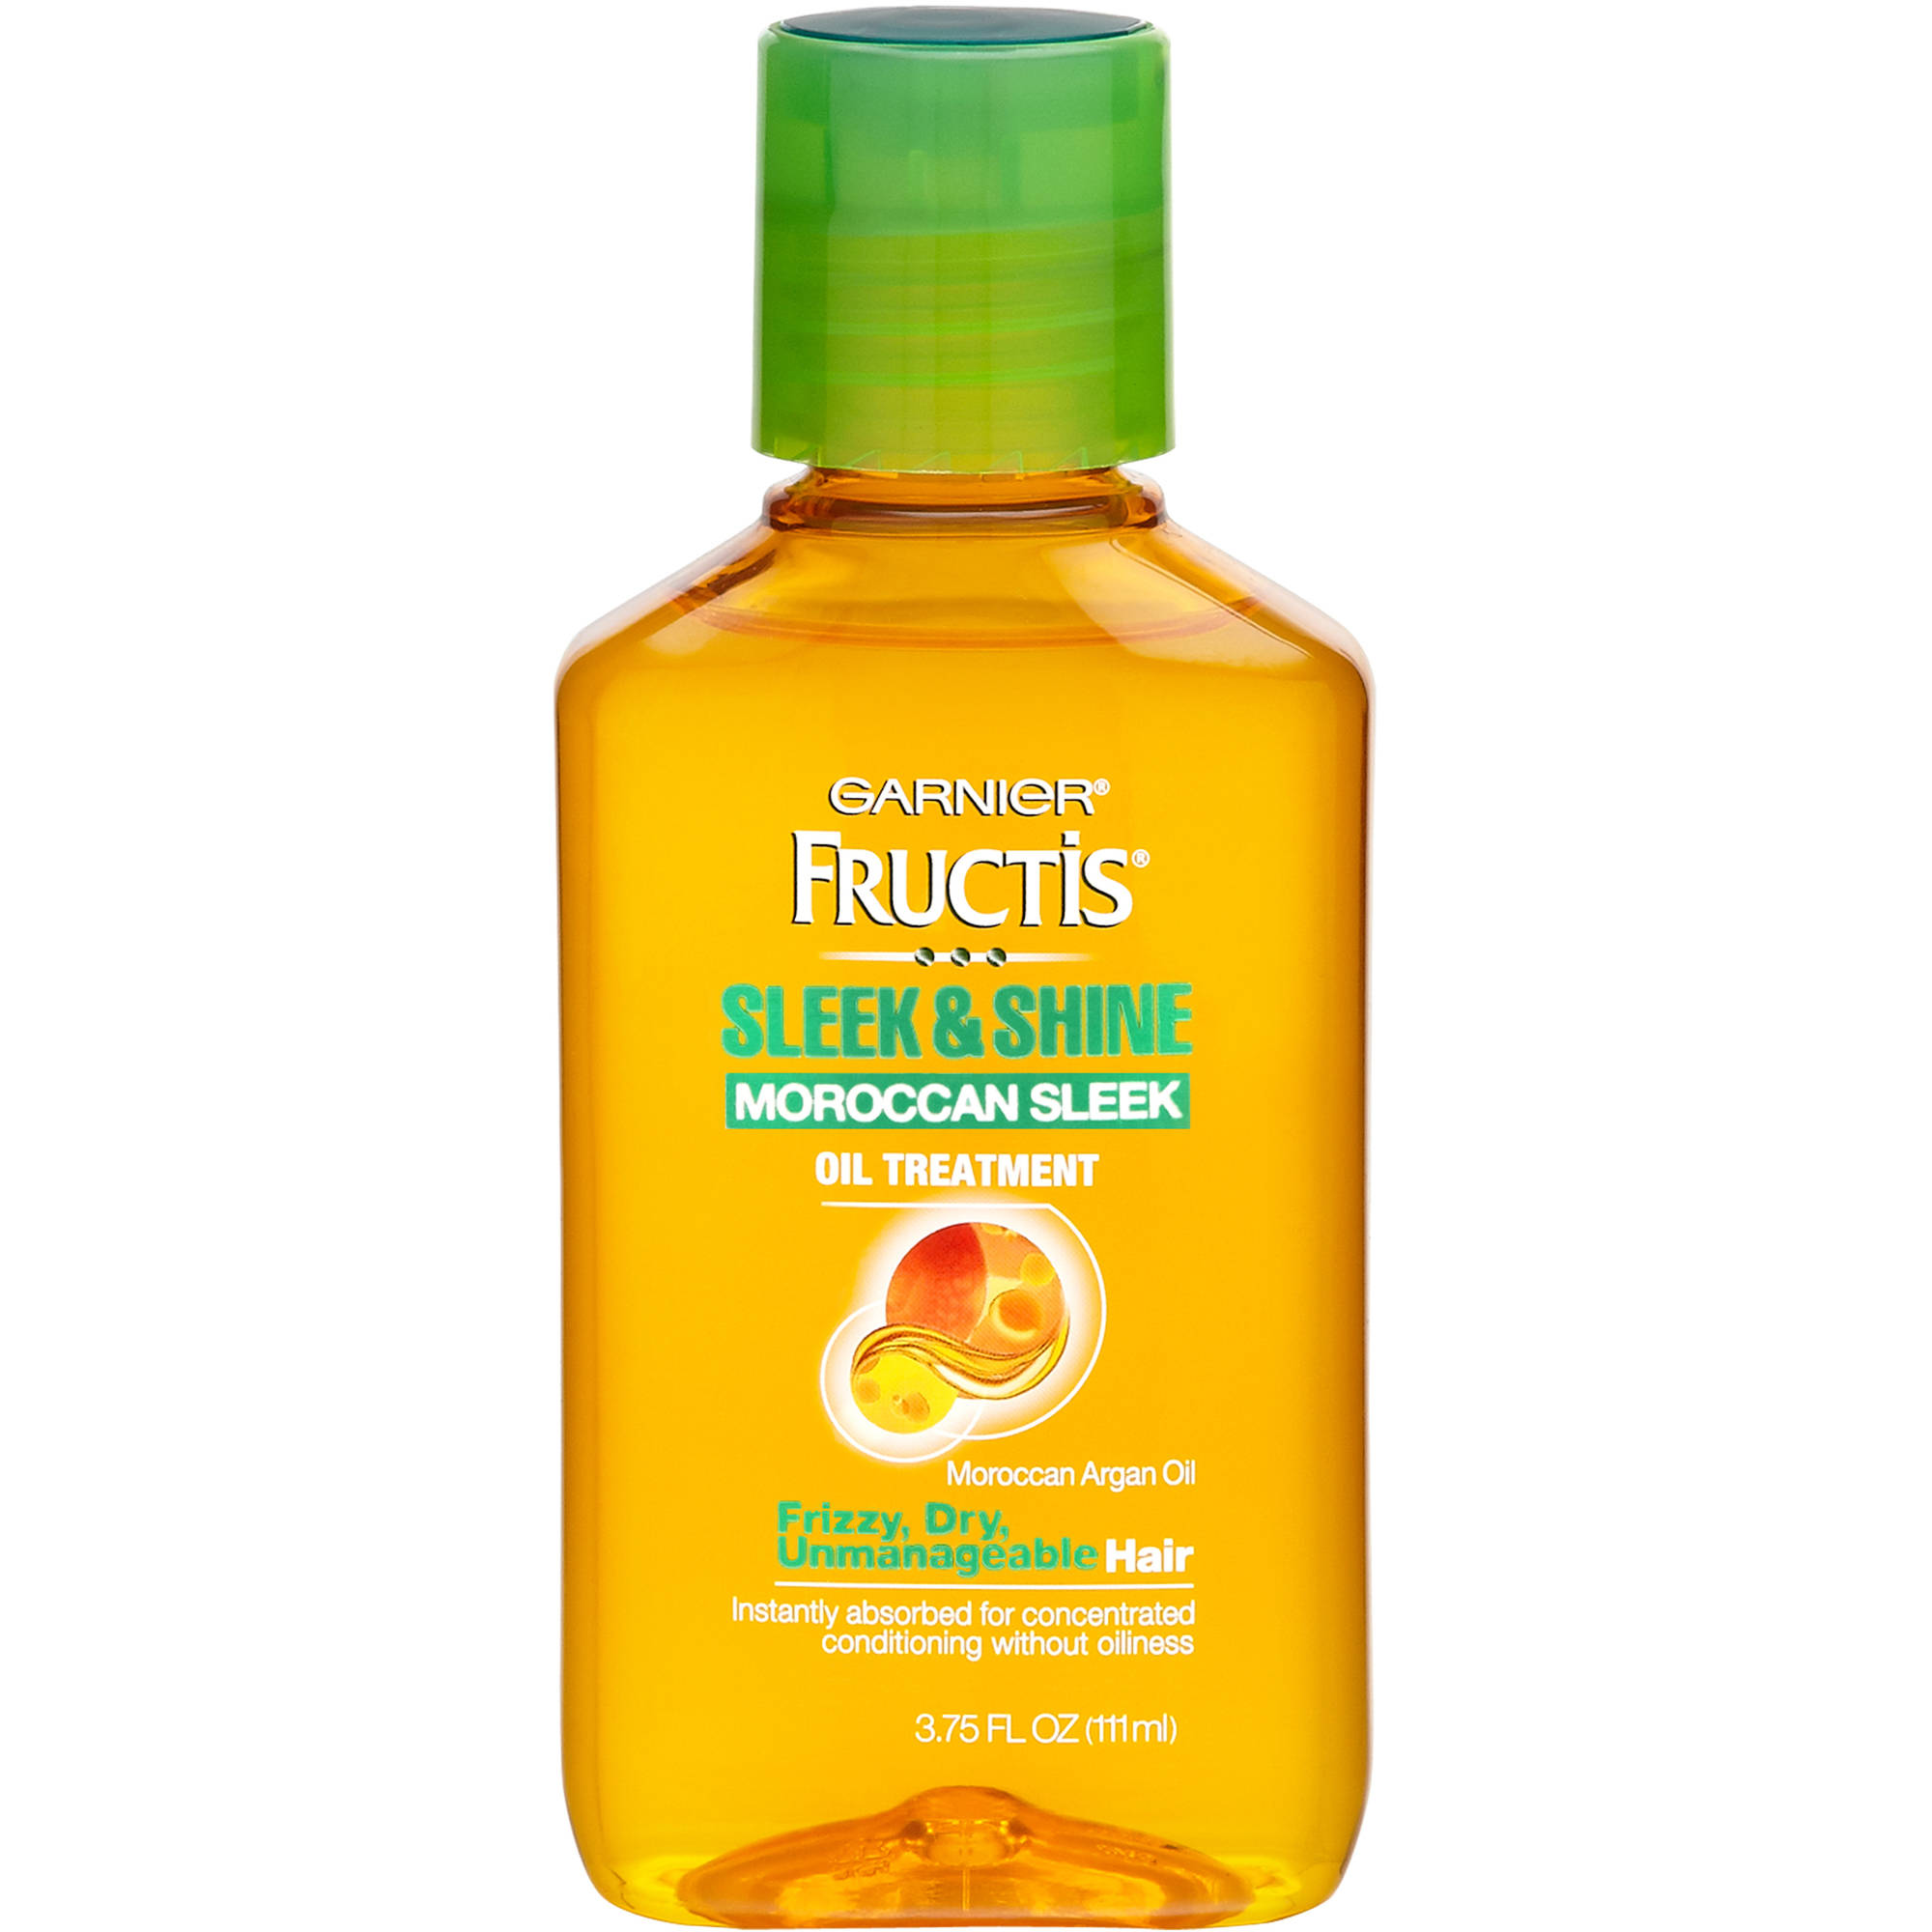 Garnier Fructis Sleek & Shine Moroccan Oil Treatment, 3.75 oz